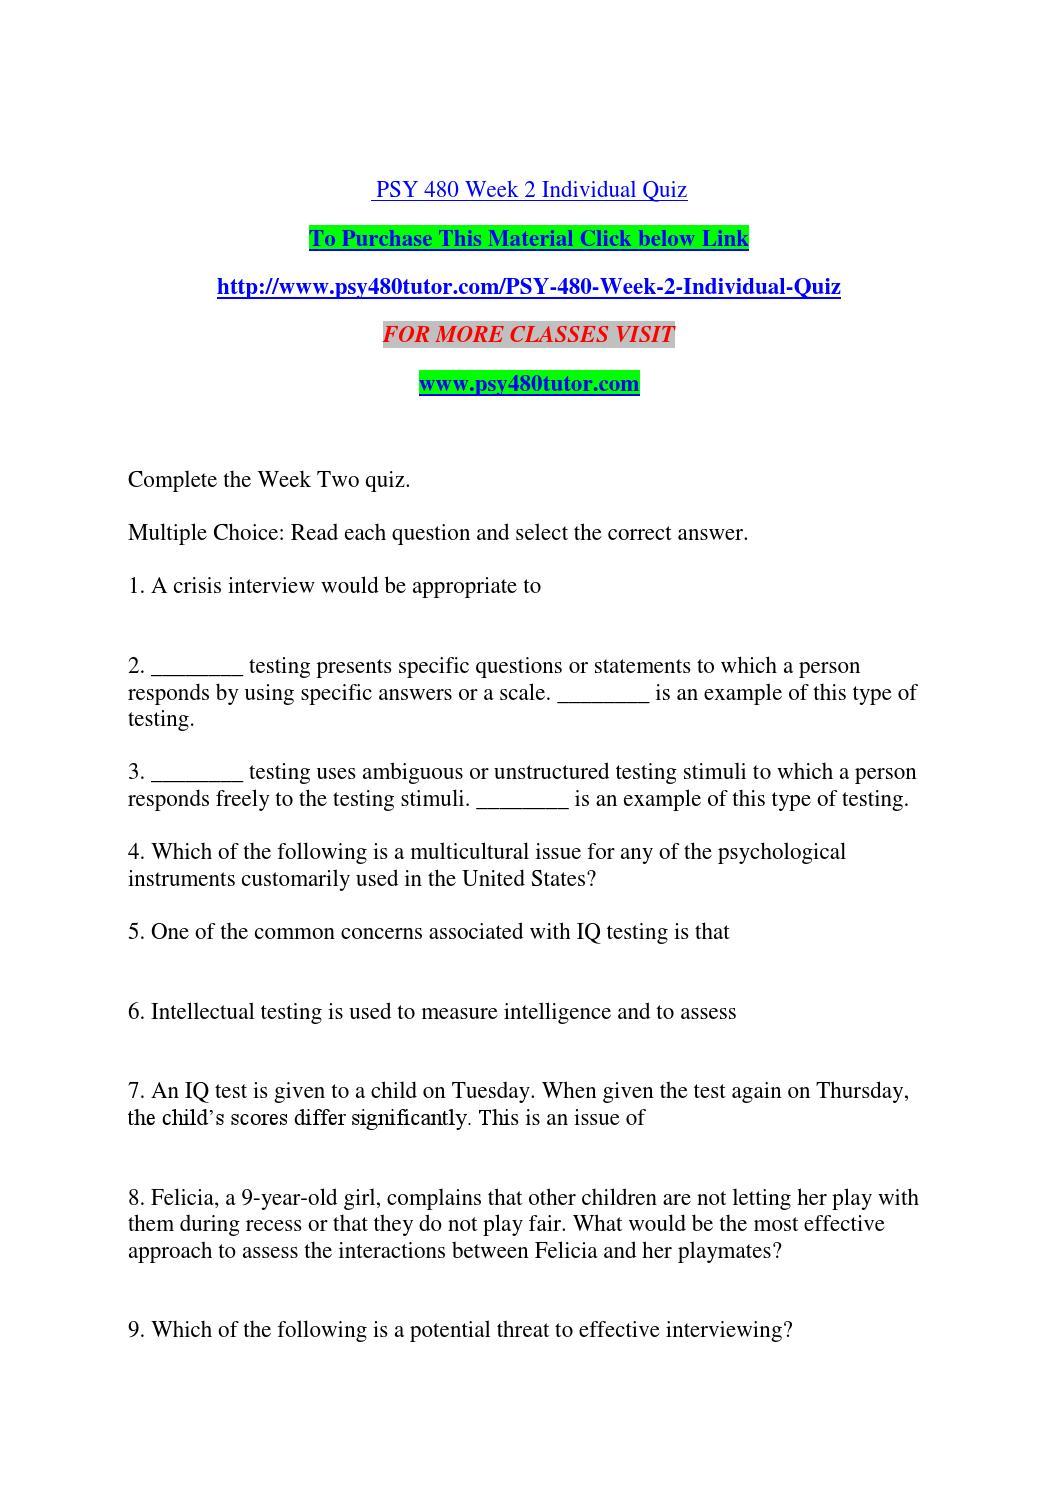 Psy 480 week 2 individual quiz by leonardjonh15 - issuu